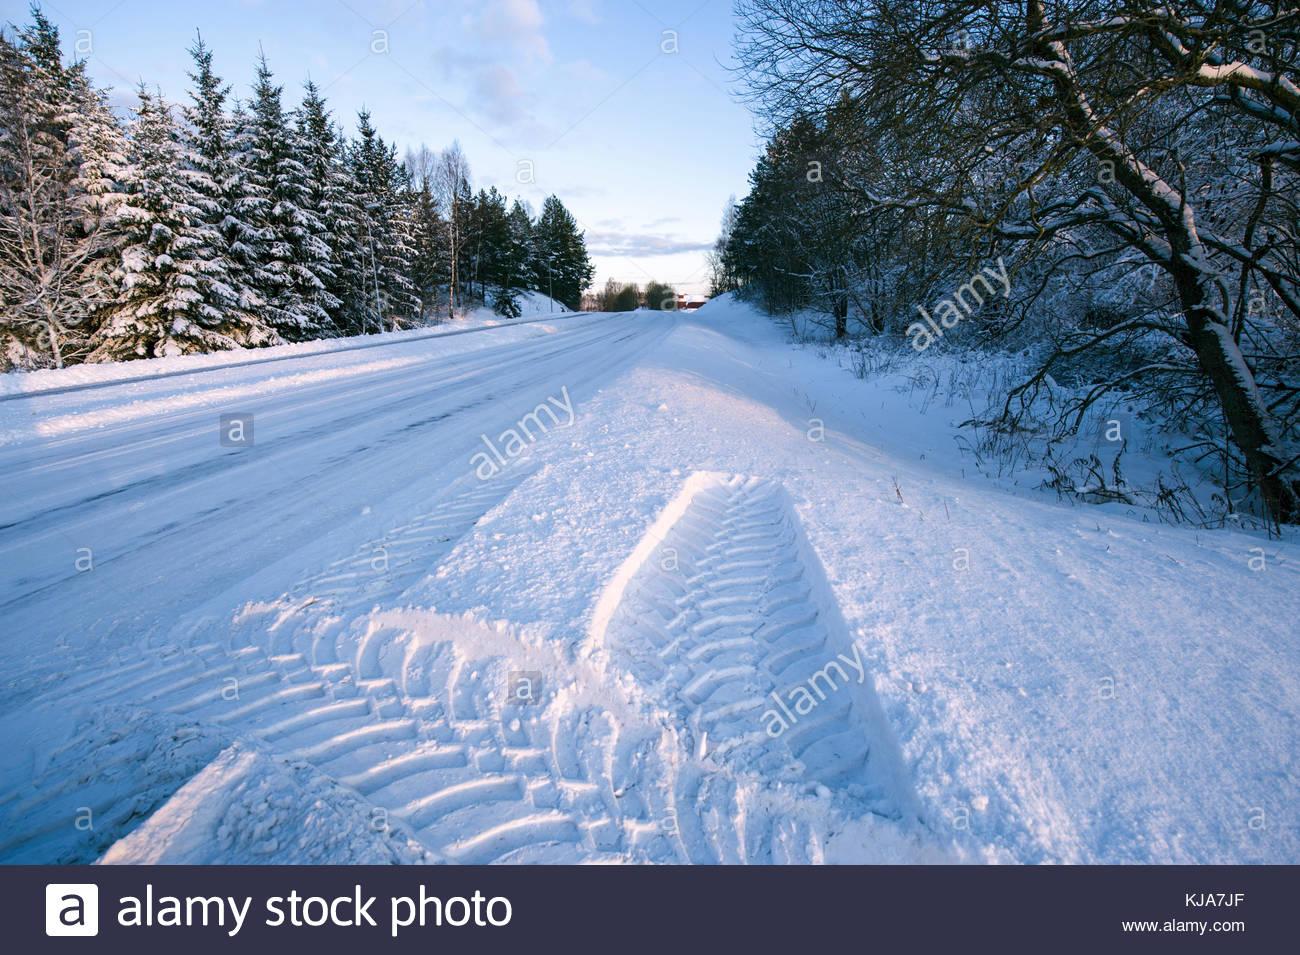 Winter wonderland. - Stock Image